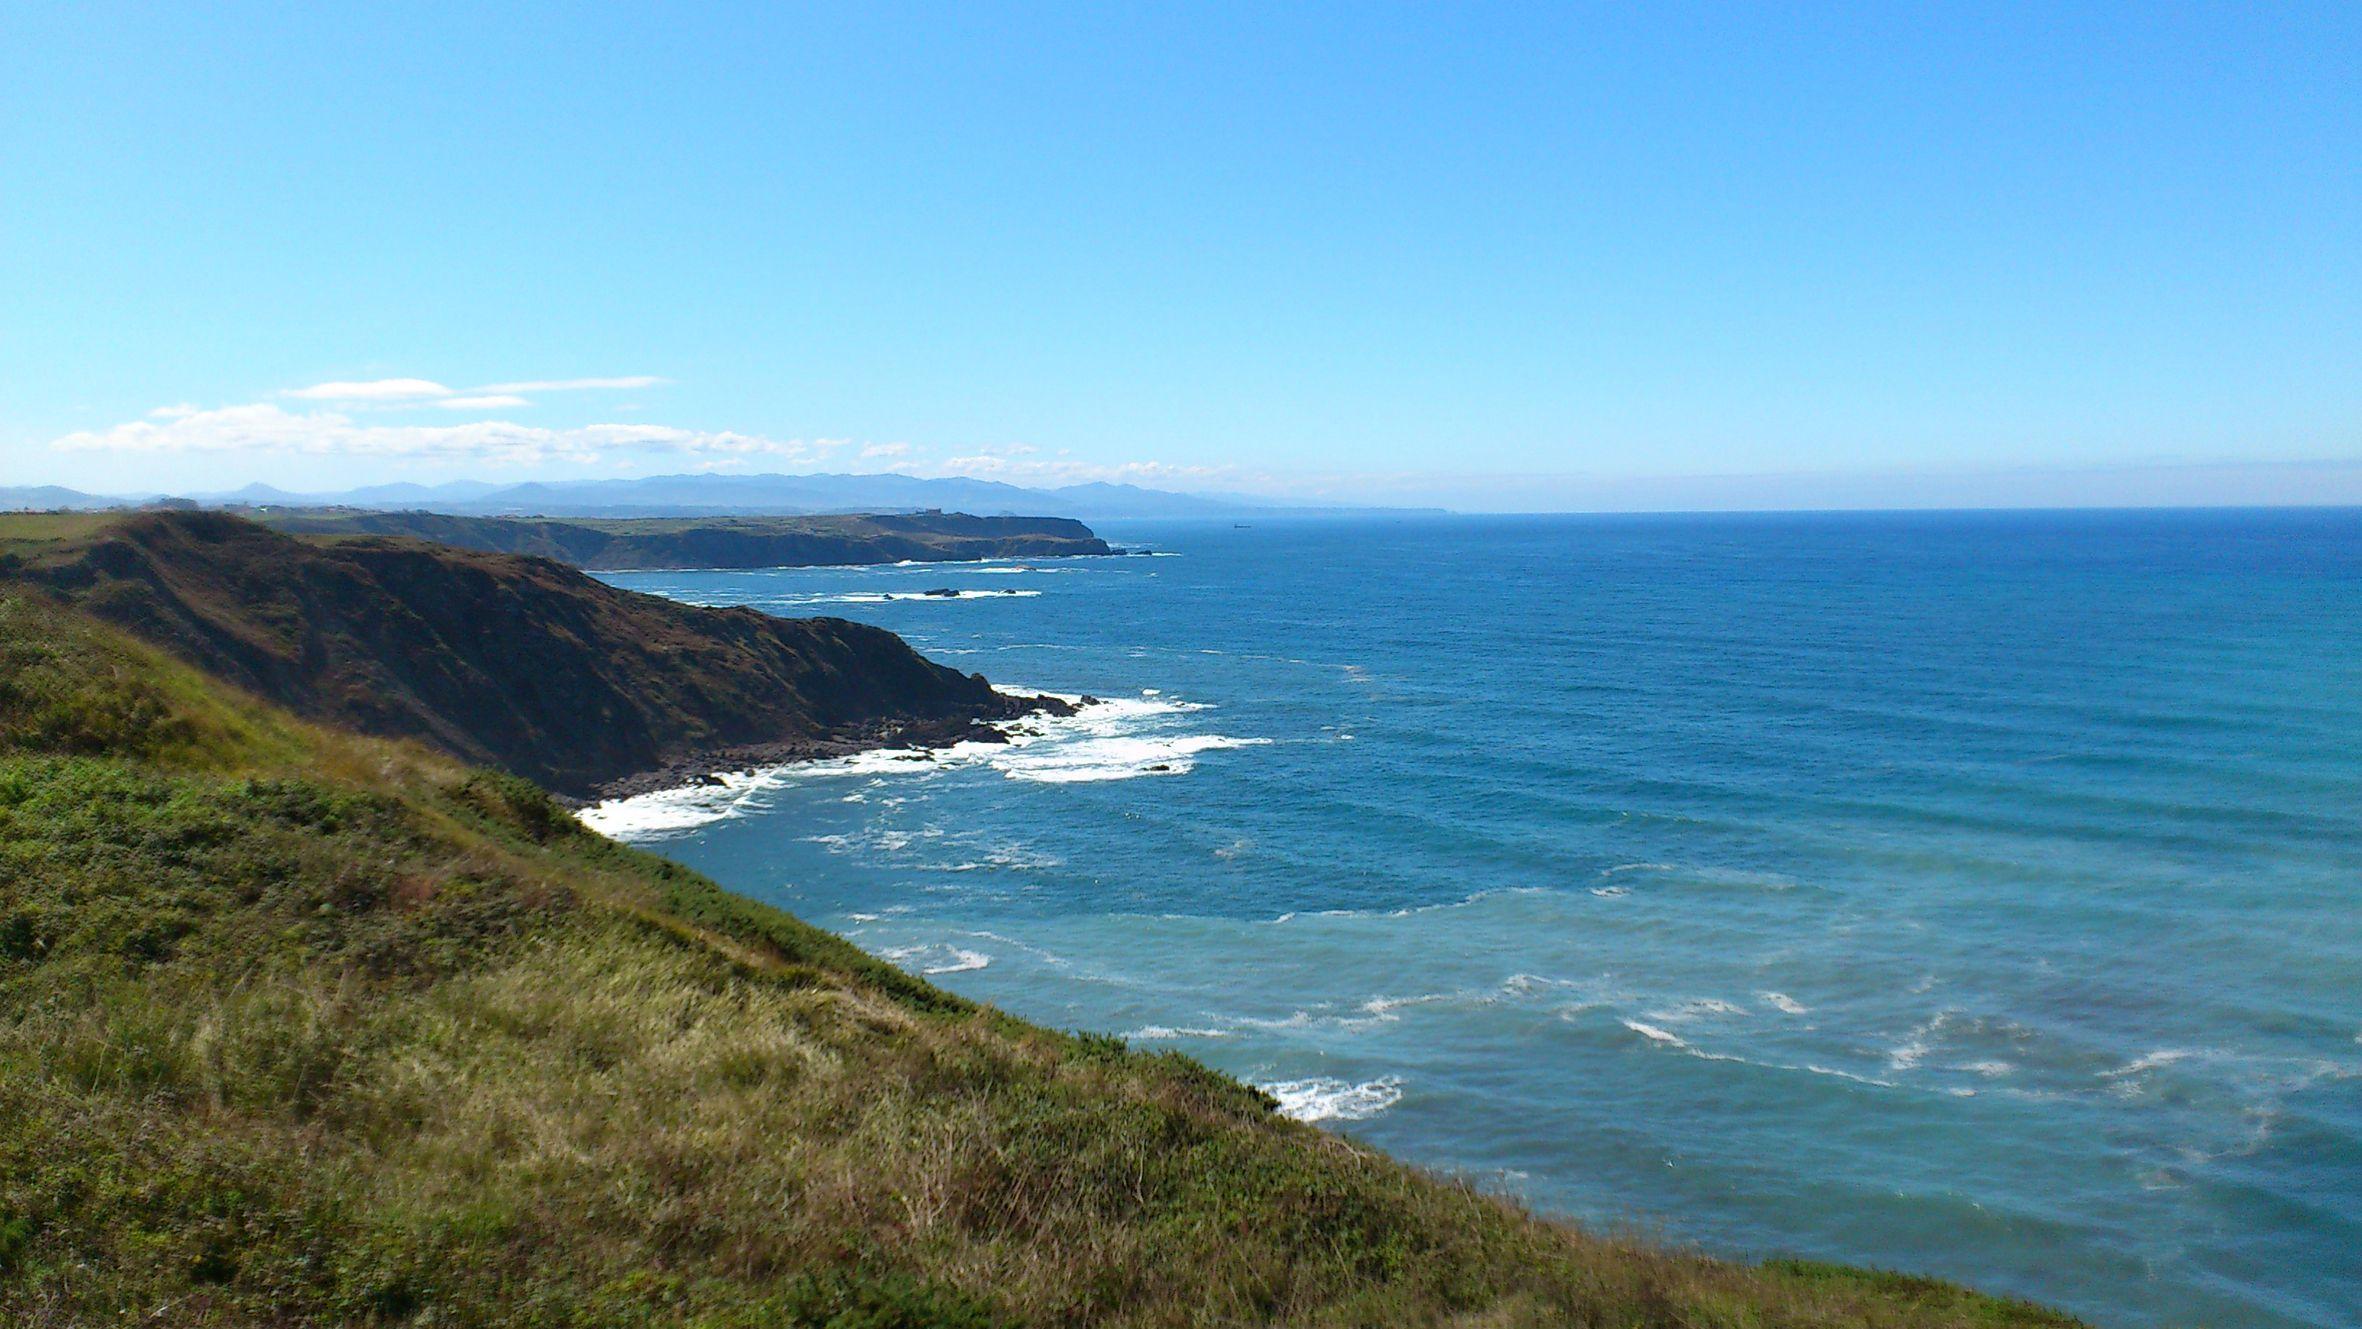 Refuerzo de la caseta de Salvamento Marítimo de la playa de San Lorenzo de Gijón.Cabo Peñas